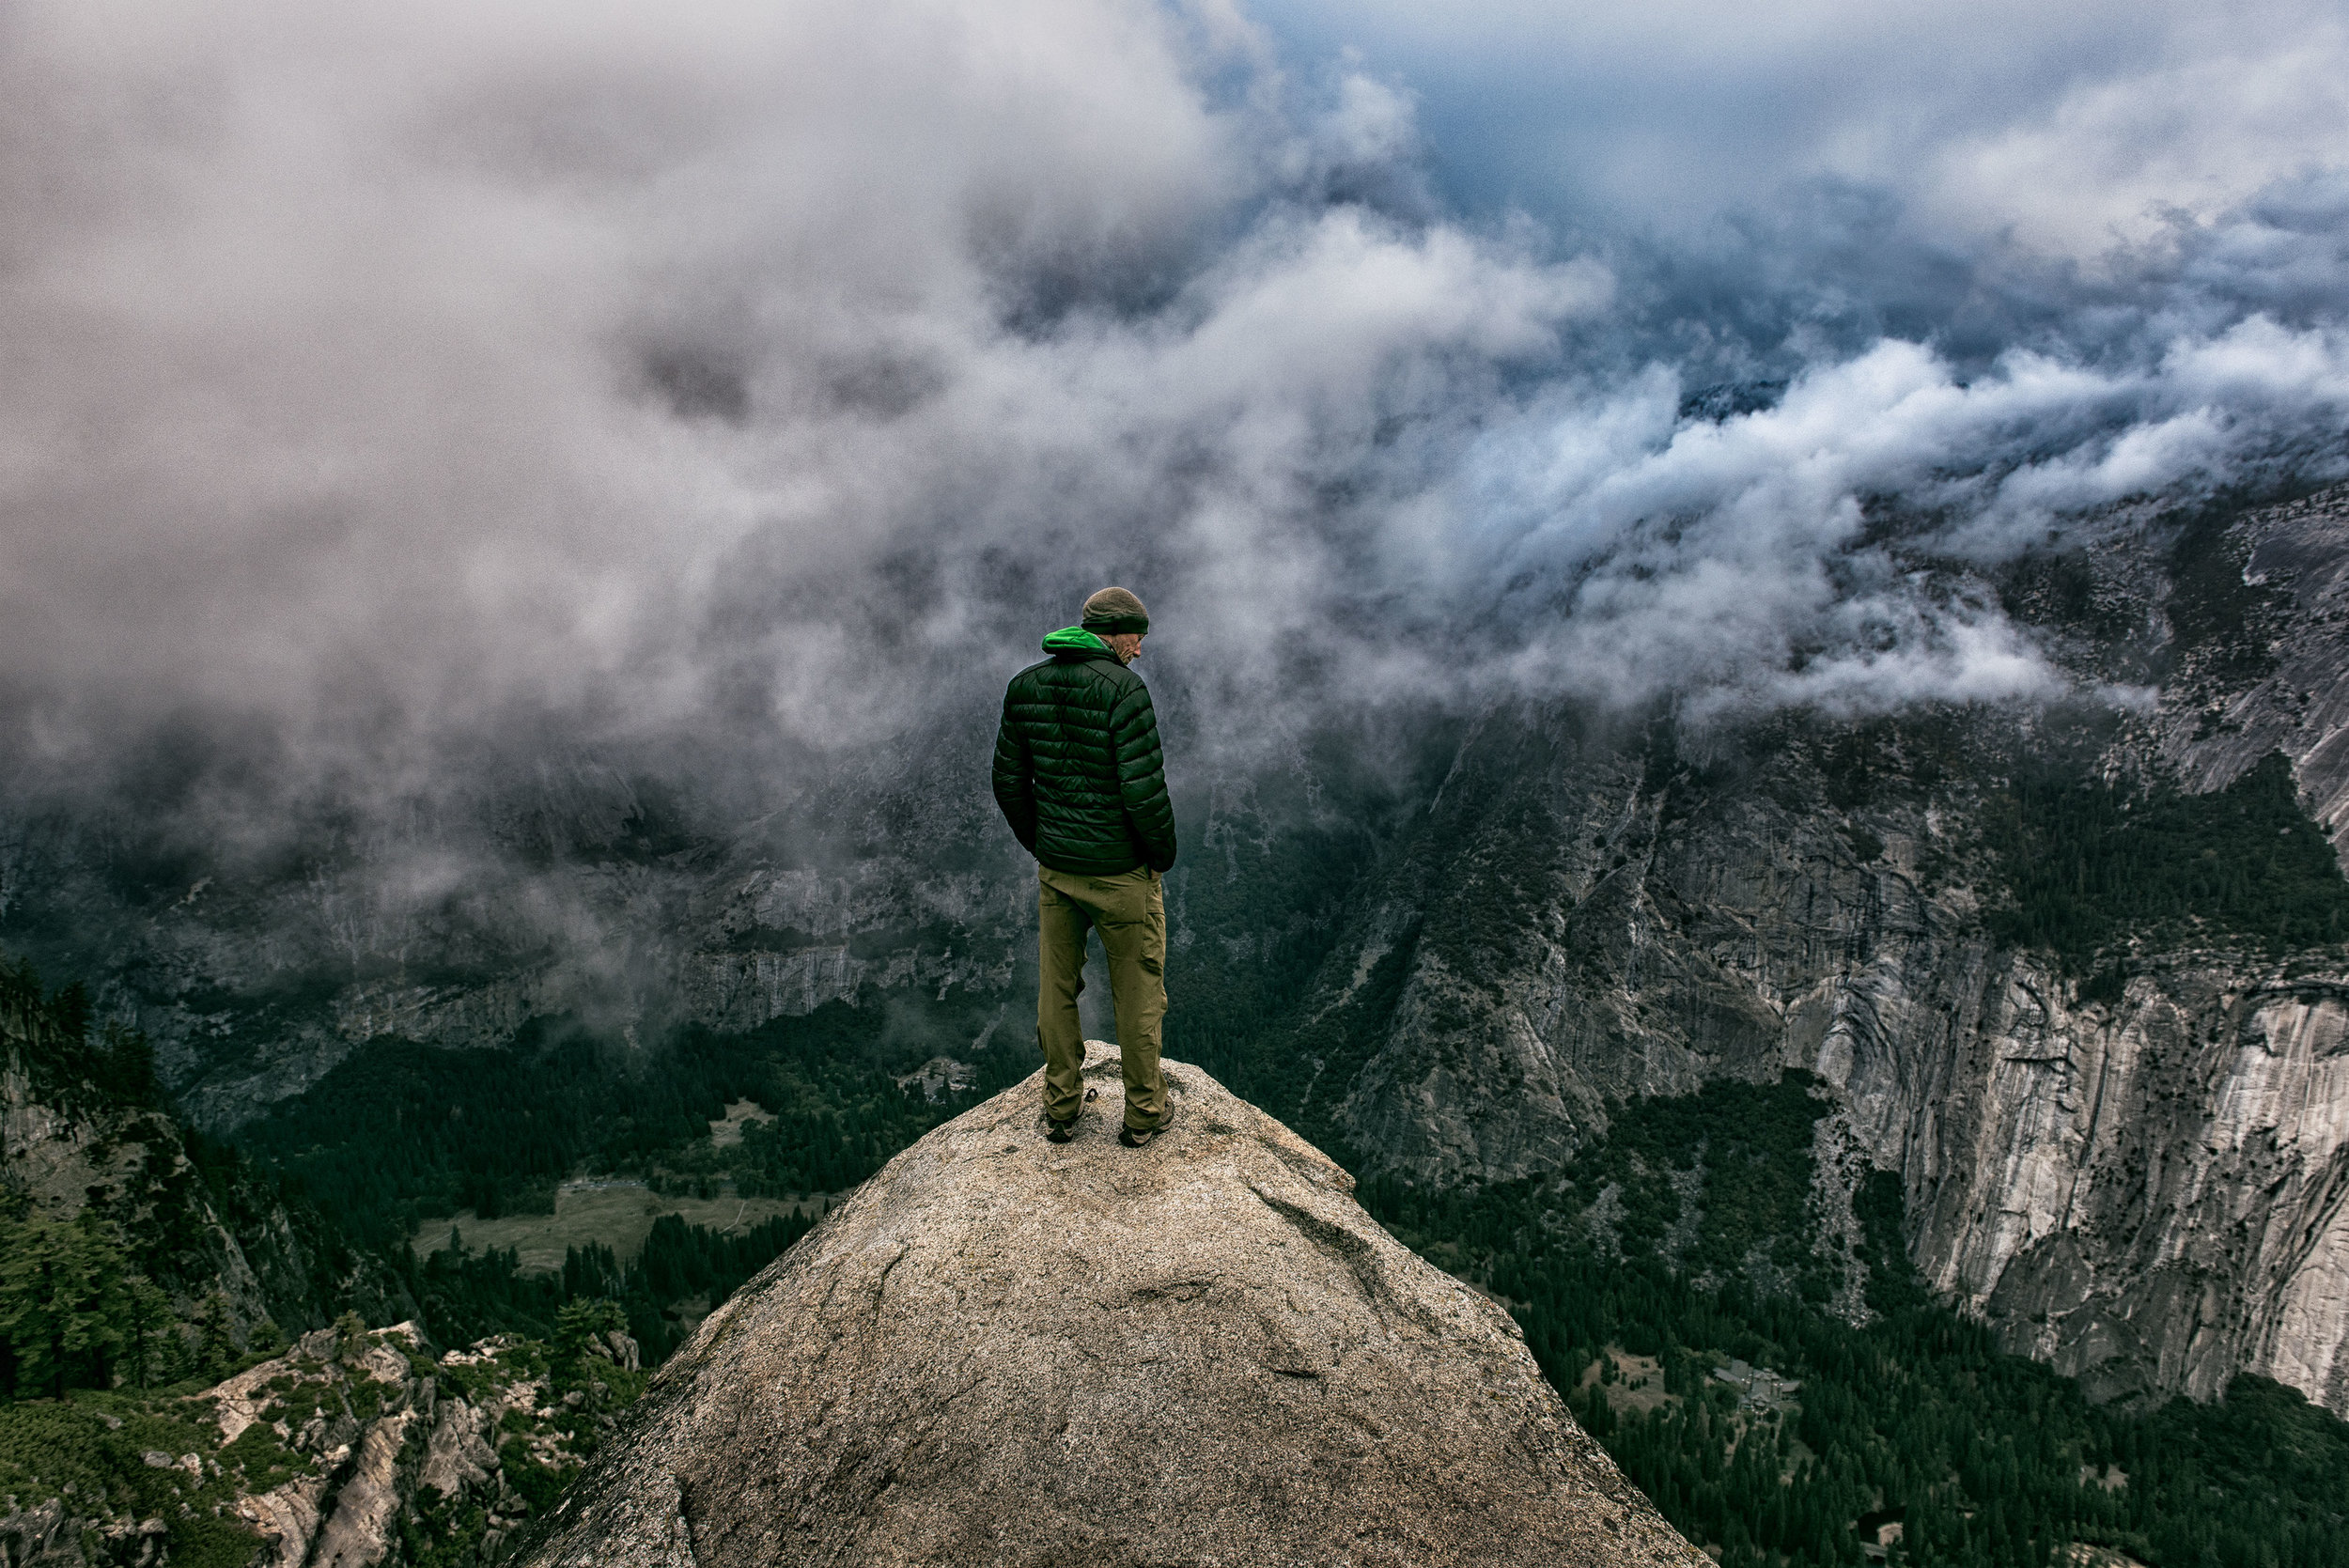 austin-trigg-wing-suit-base-jump-fly-yosemite-lifestyle-california-adventure-thrill-seeking-glacier-point-cliff-cloudy.jpg